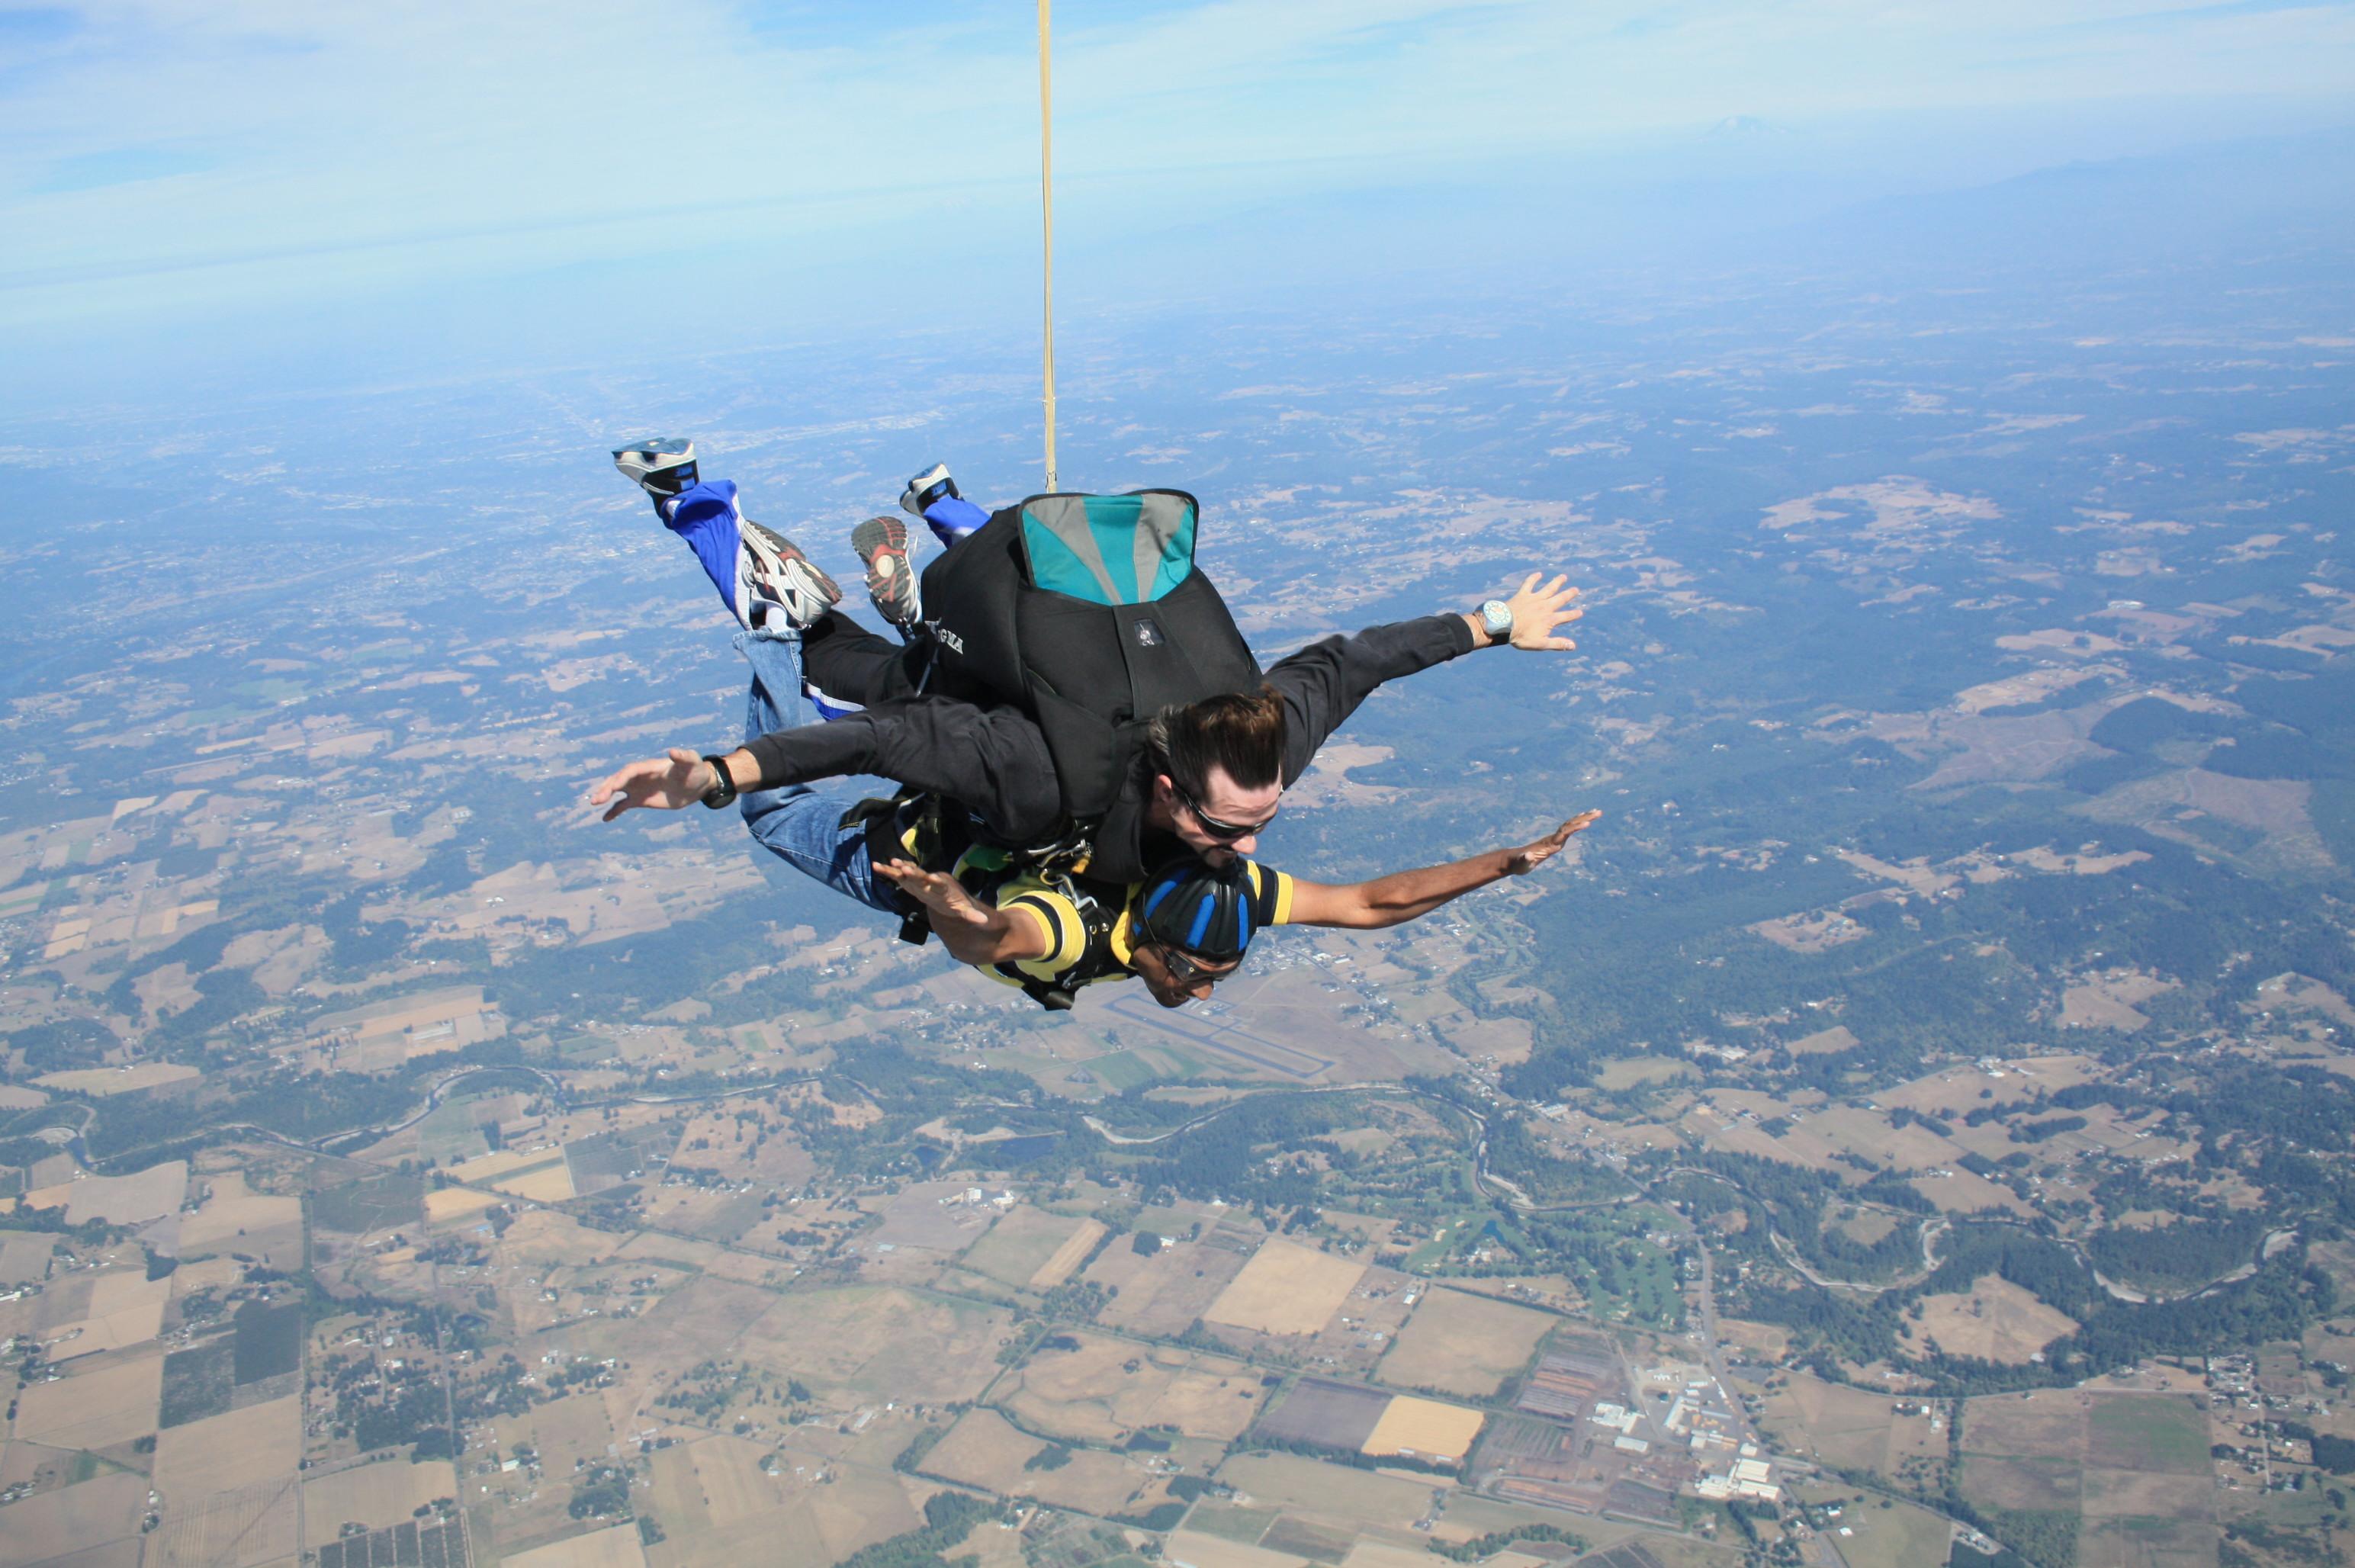 Skydive in 2012 in Portland, Oregon